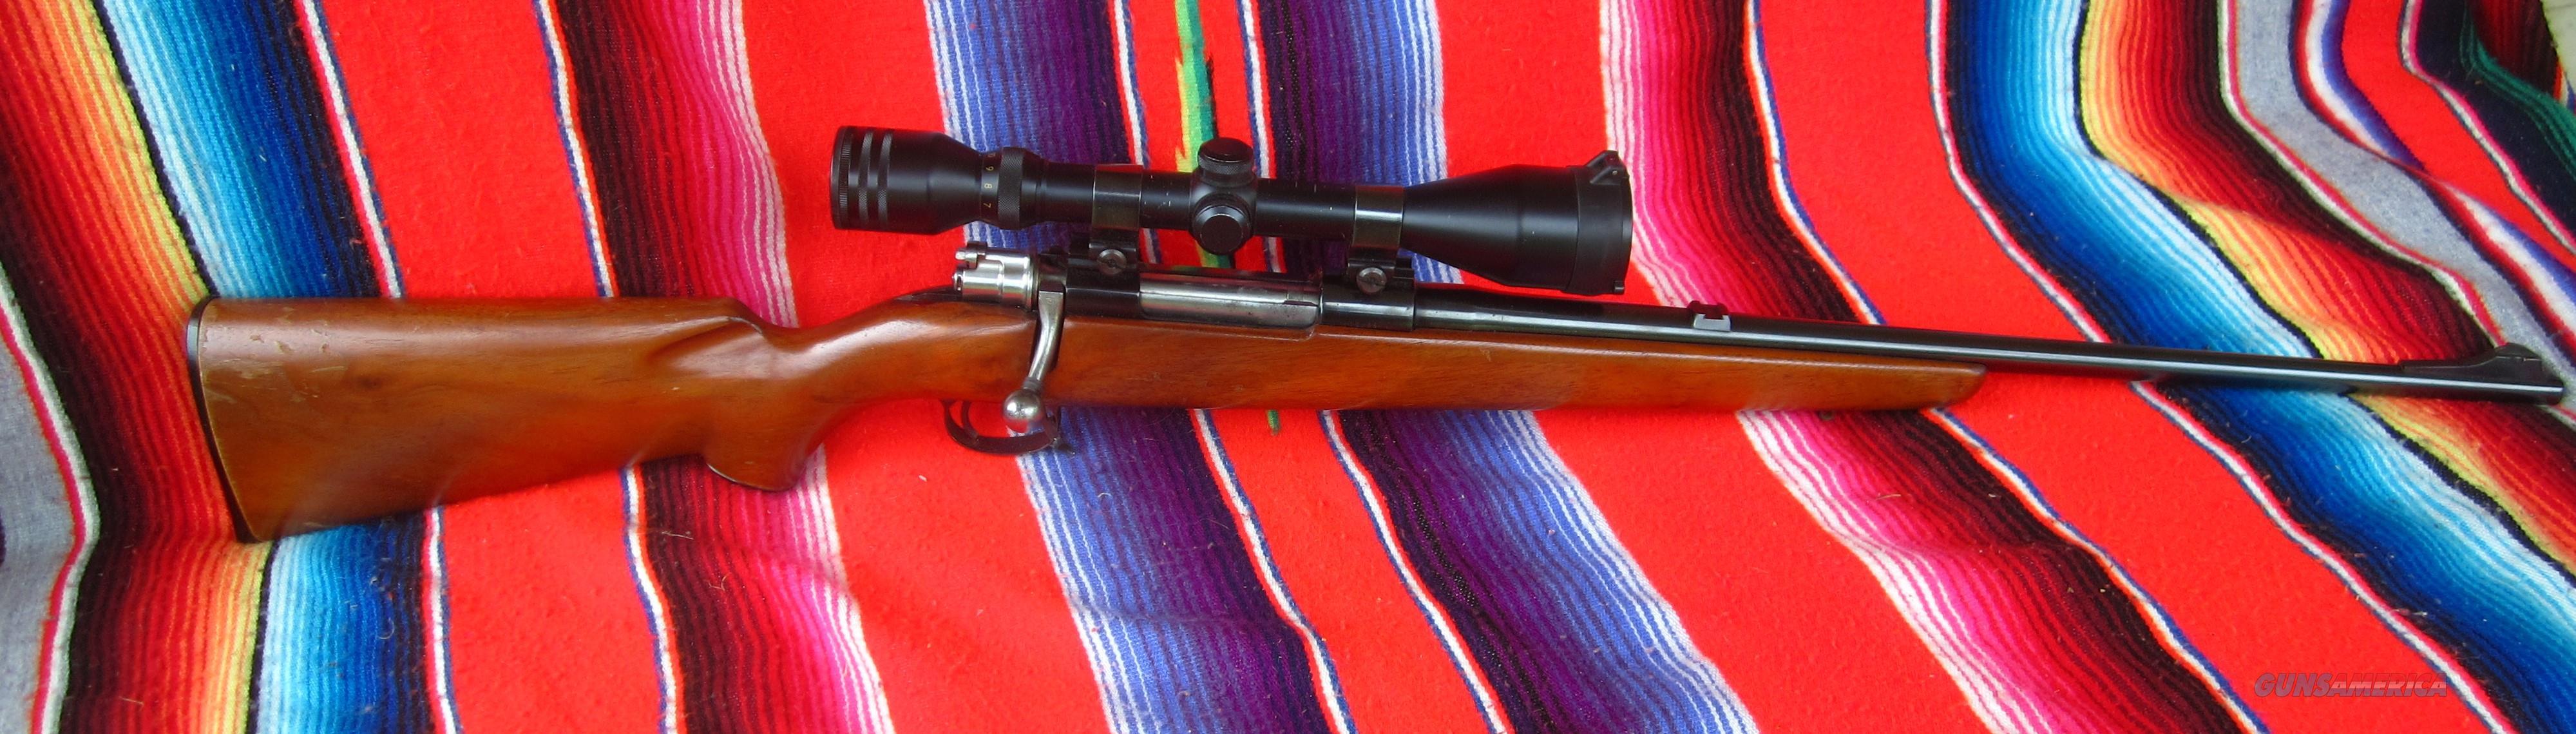 FN action 'JC Higgins' 30-06  Guns > Rifles > FNH - Fabrique Nationale (FN) Rifles > Bolt action > Hunting